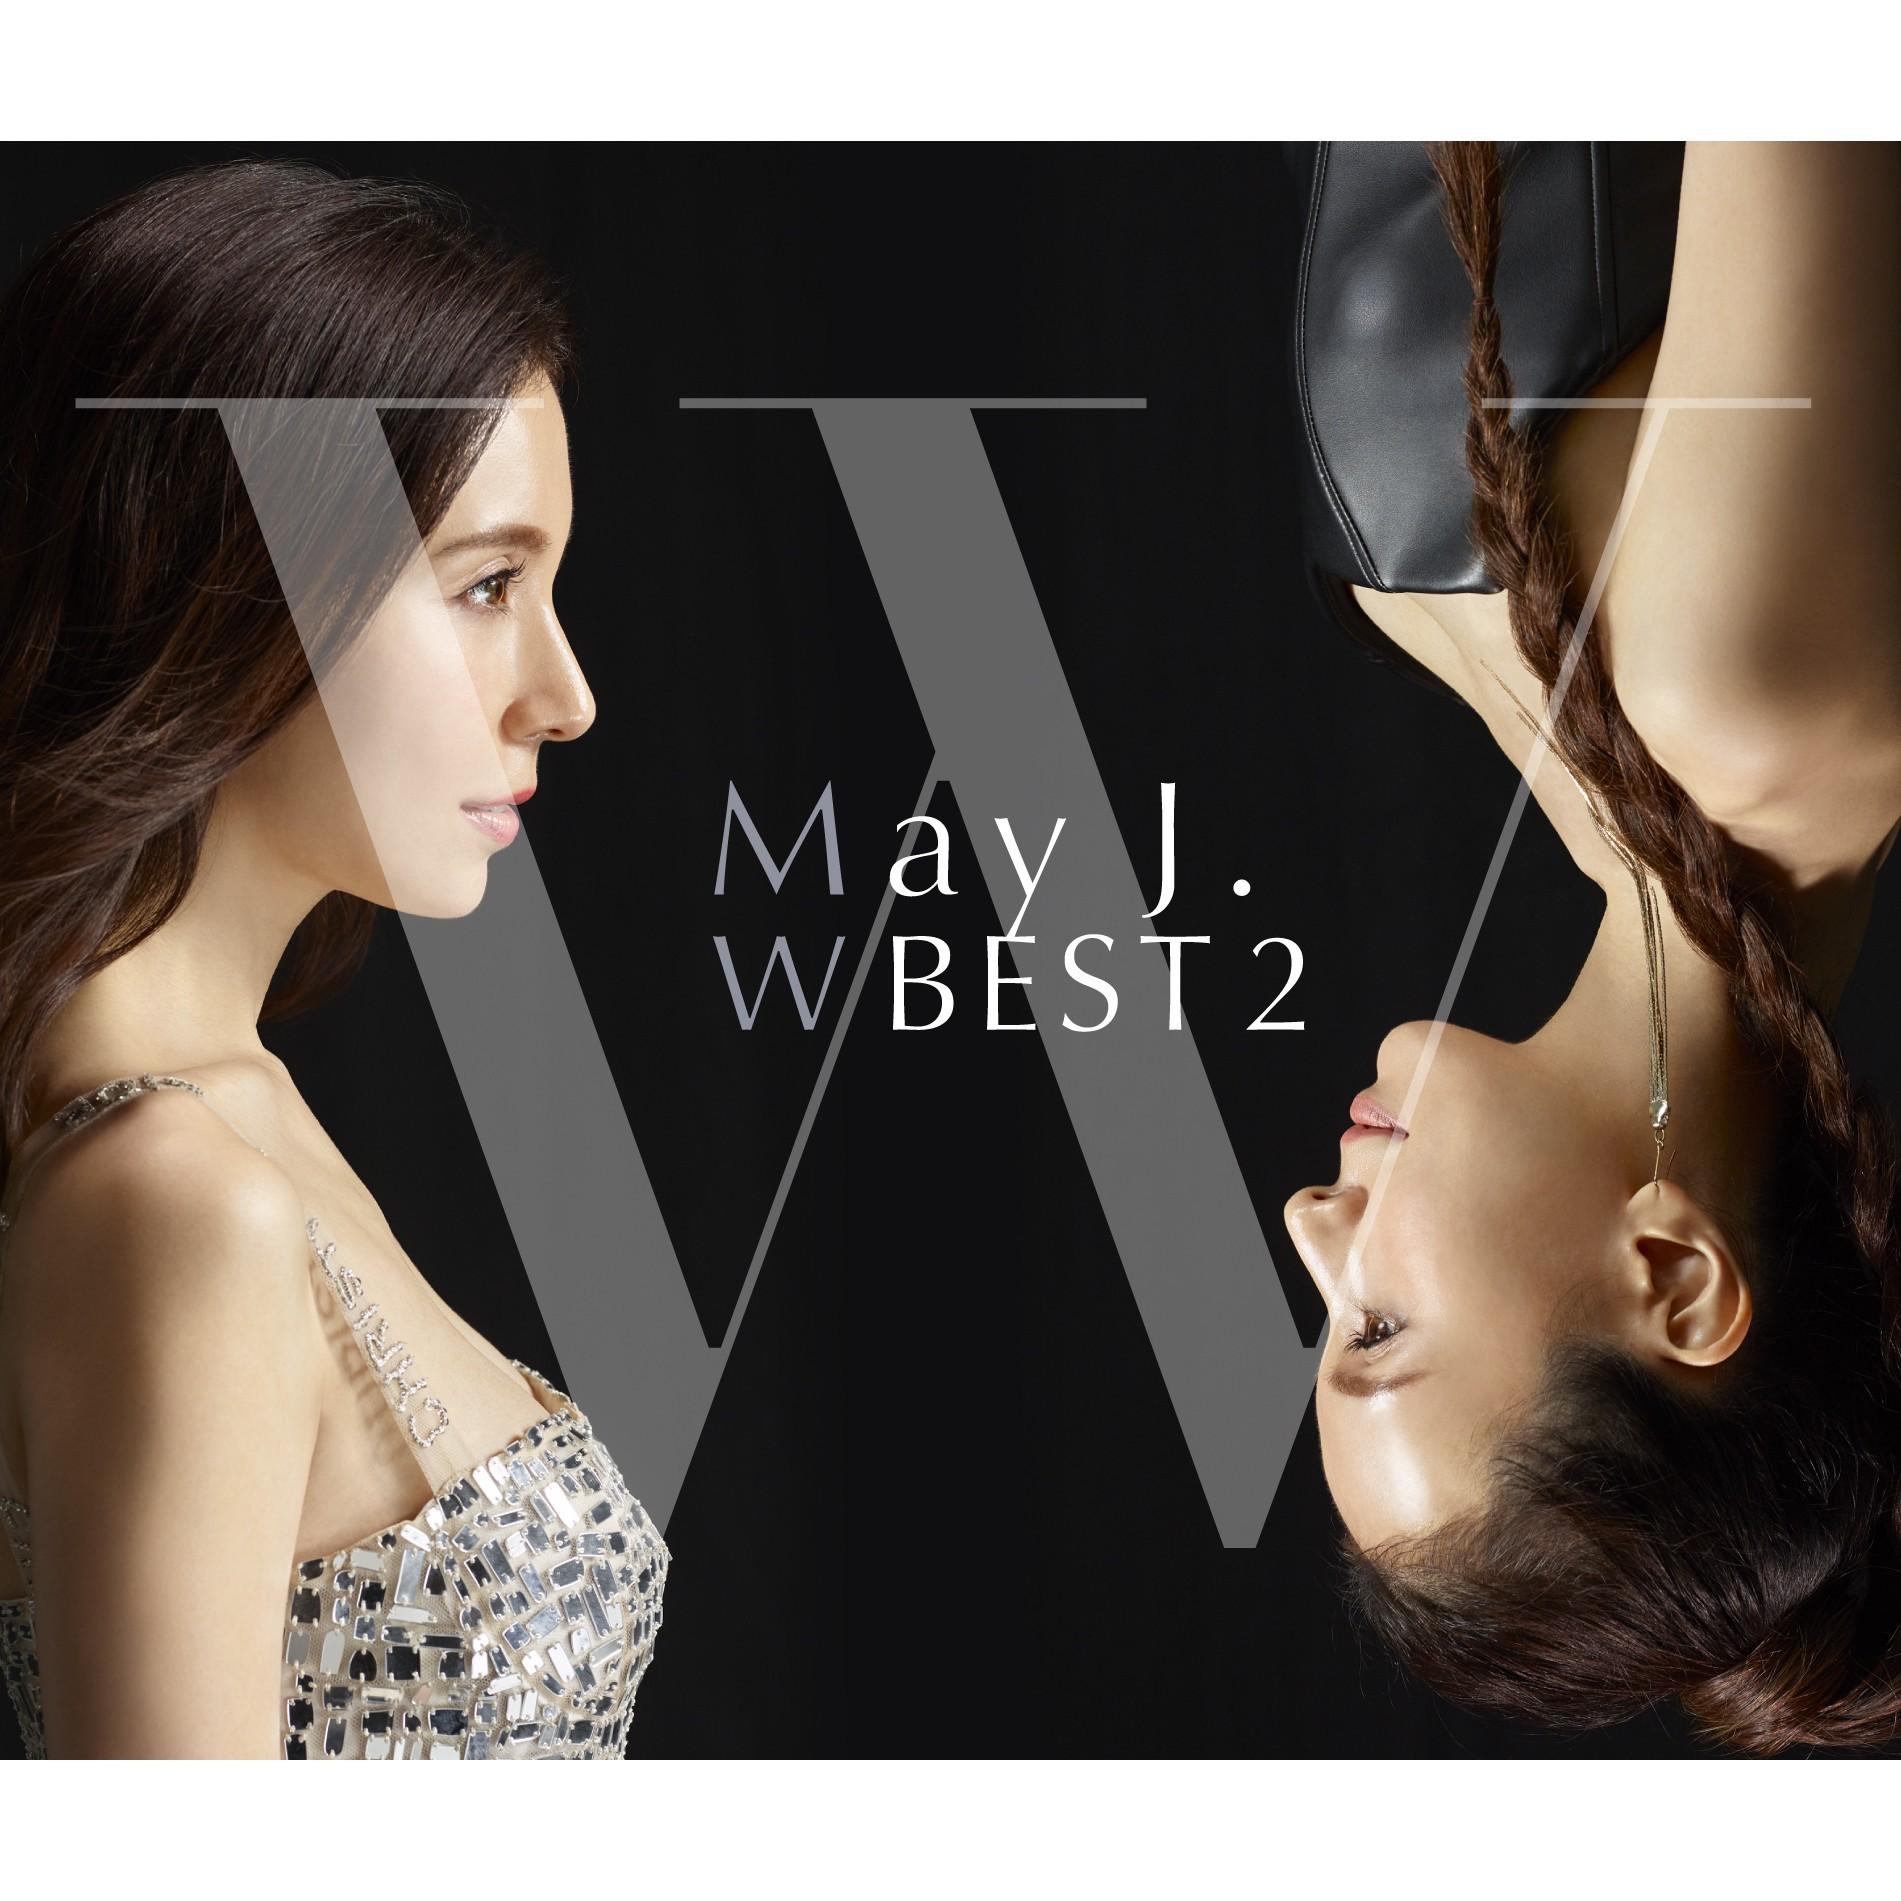 May J. – May J. W BEST 2 -Original & Covers- [FLAC / 24bit Lossless / WEB] [2020.12.24]